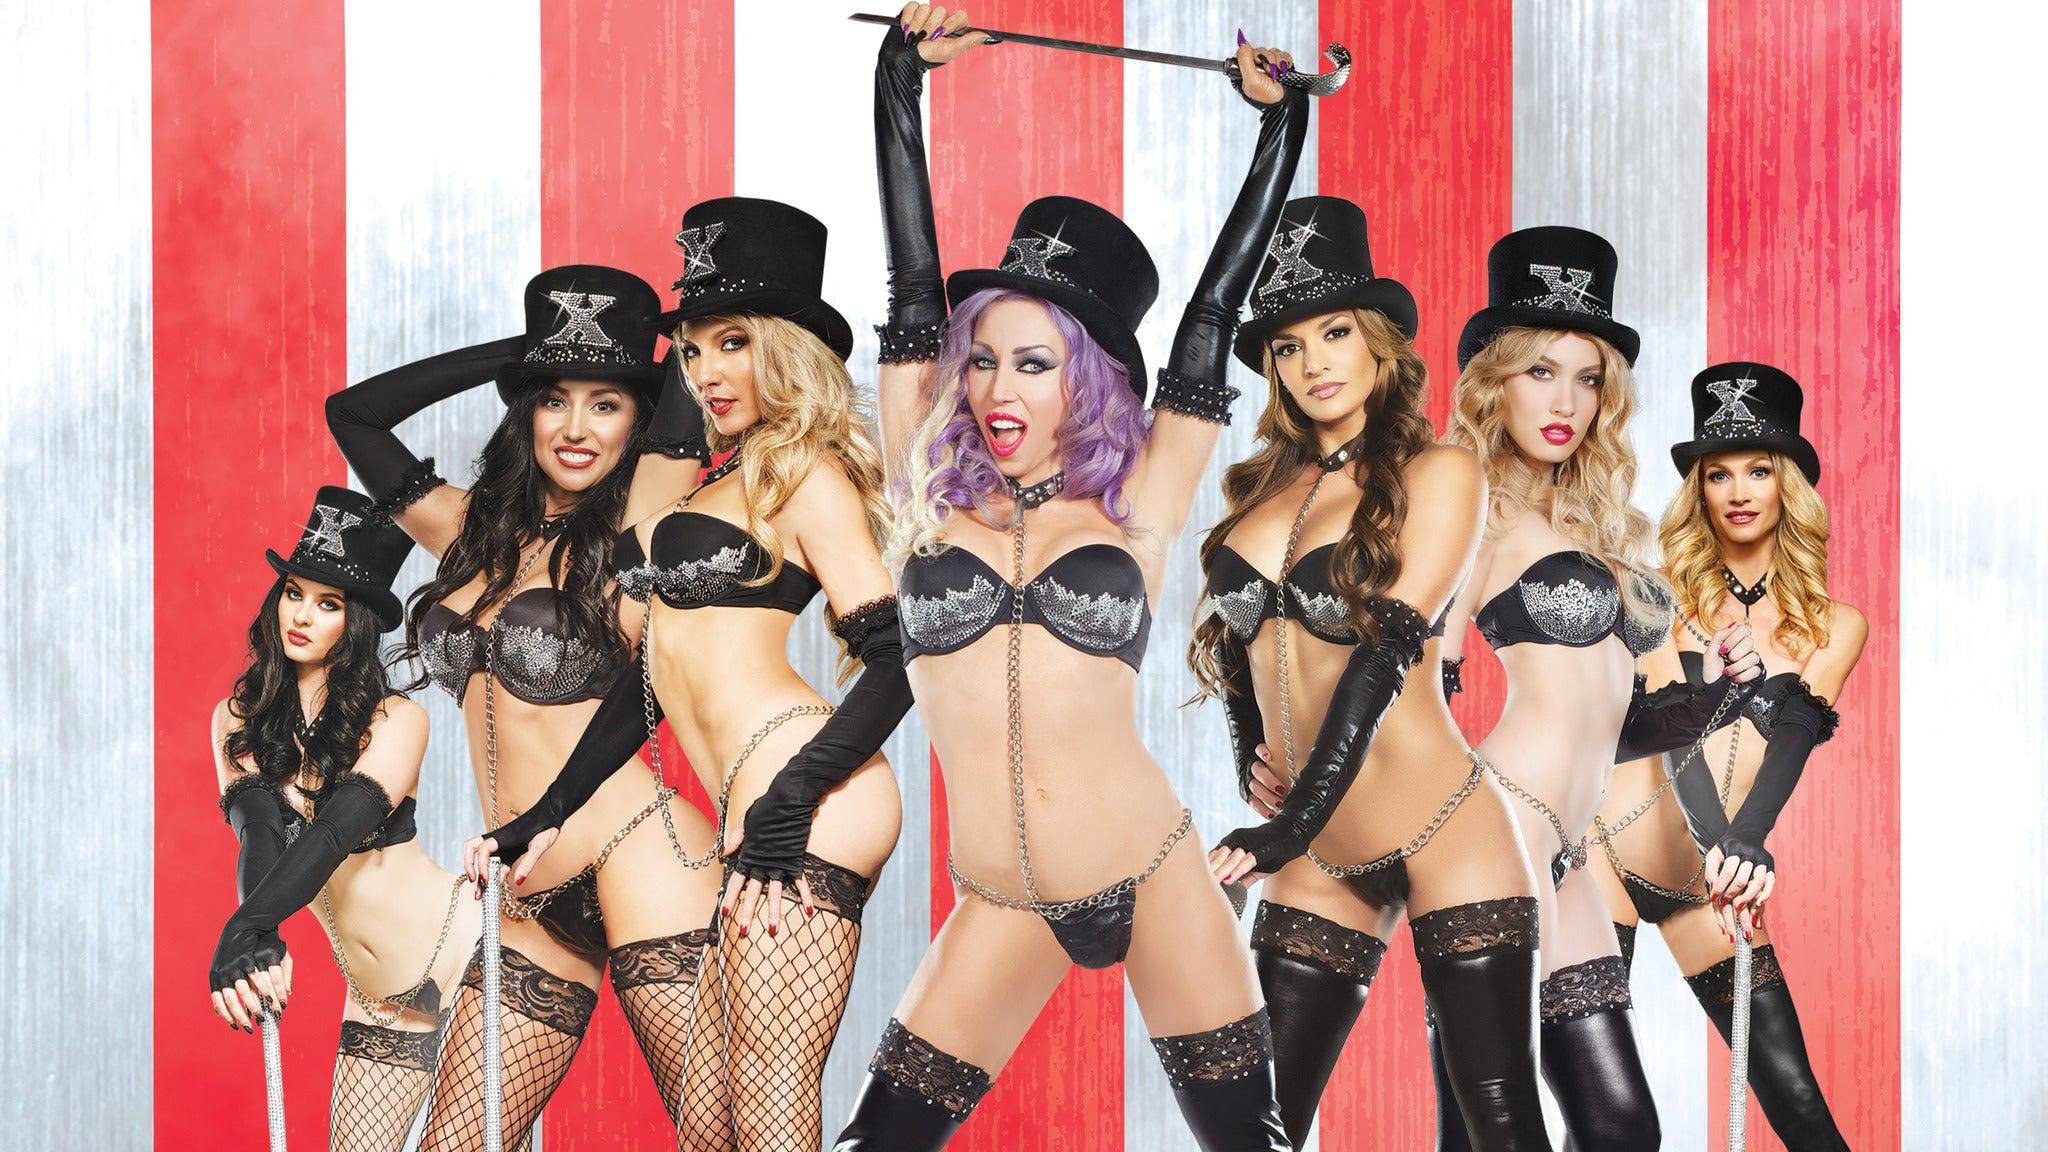 X Rocks | Las Vegas, NV | The Back Room at Bally's Las Vegas | December 10, 2017